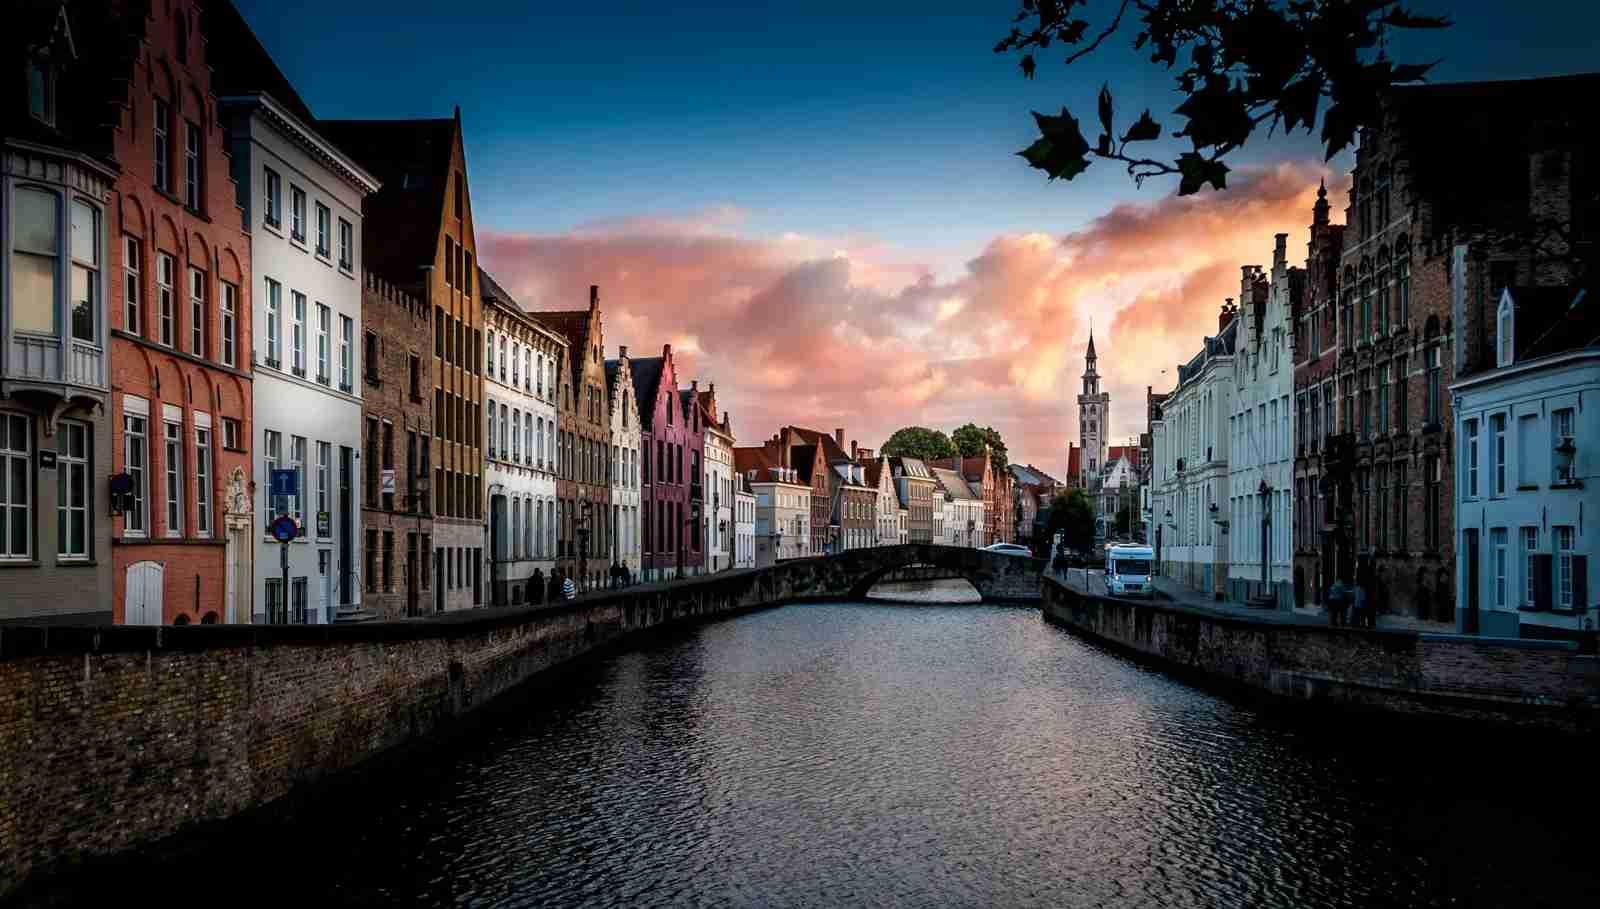 Bruges, Belgium. (Photo by Borislav Zlatkov/Getty Images)